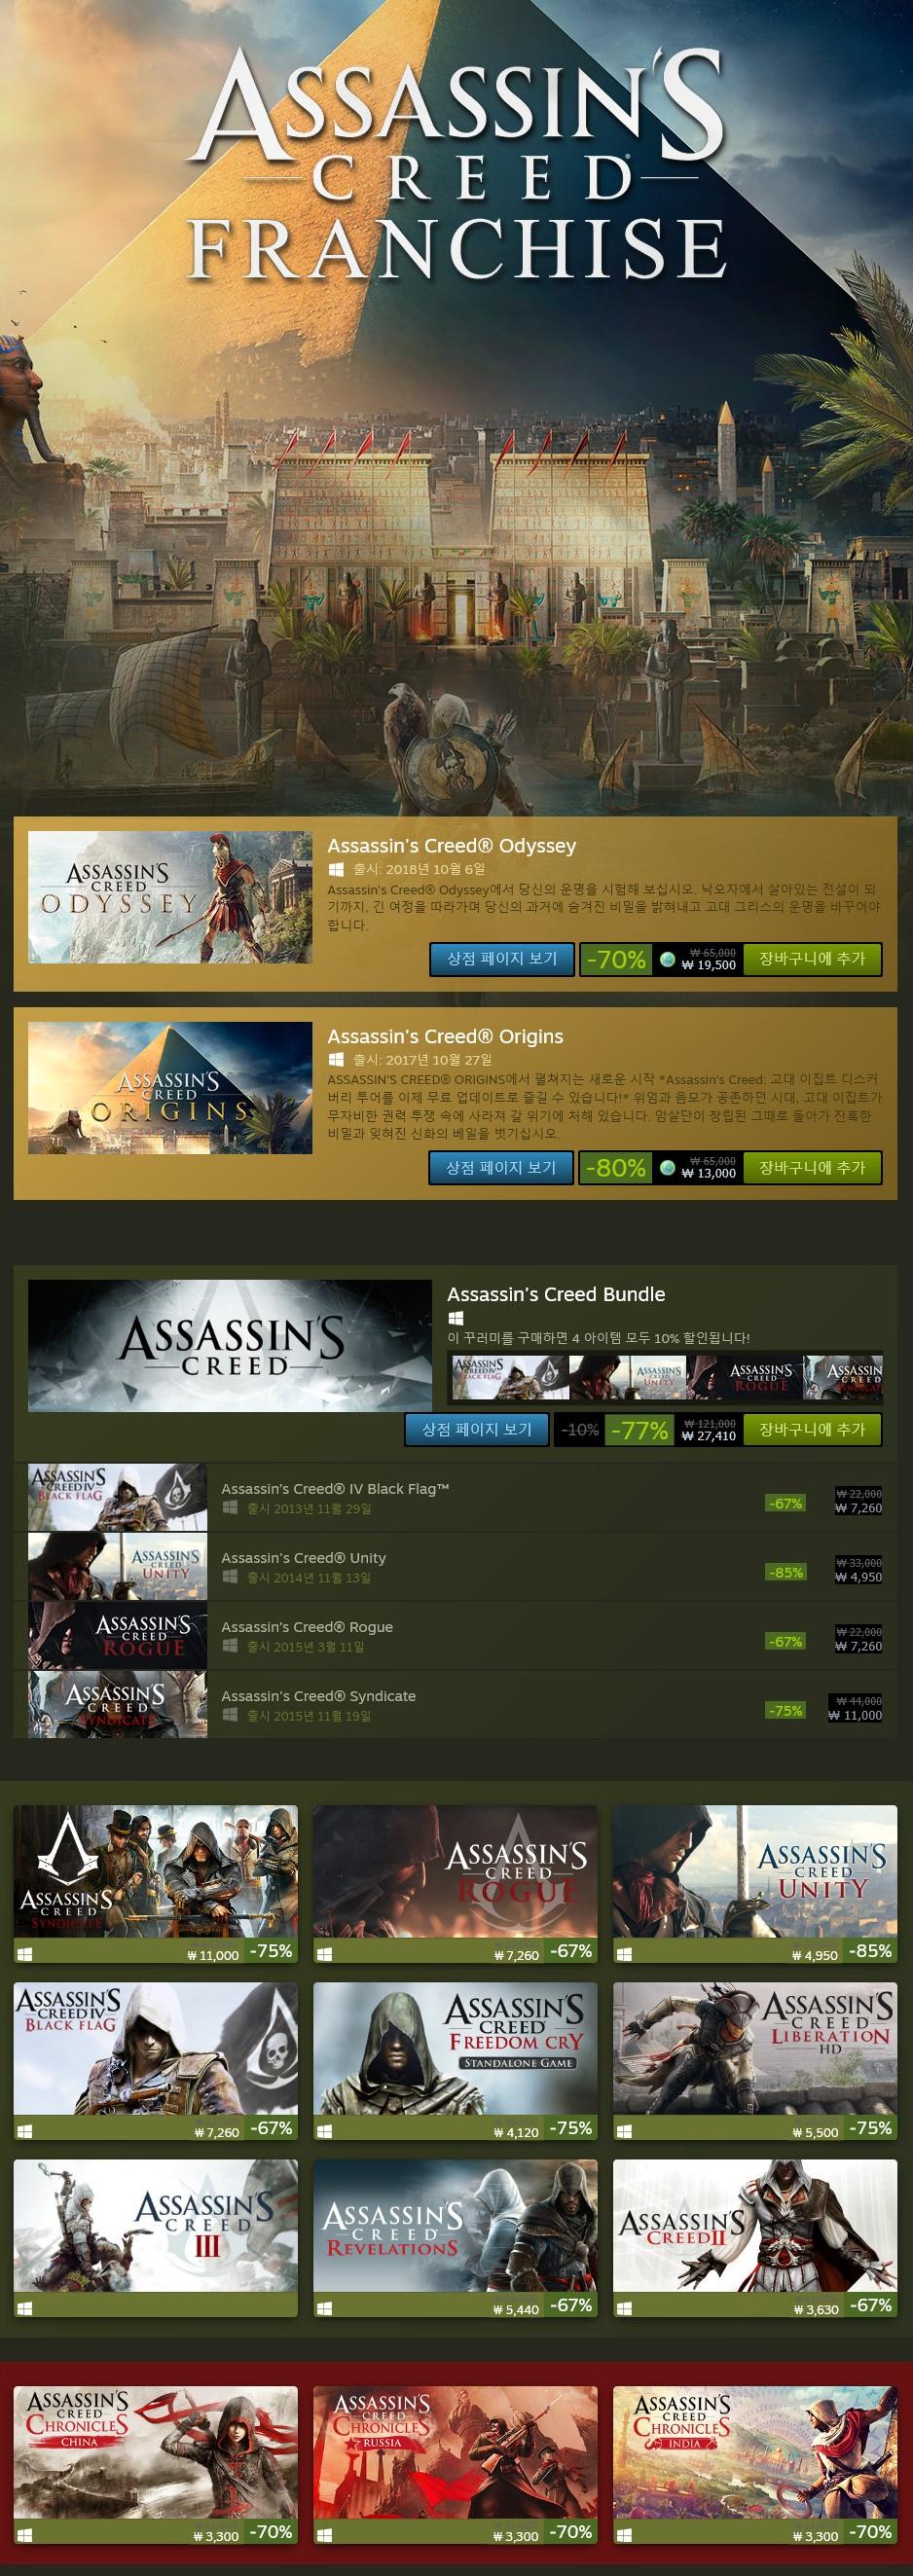 Screenshot_2020-10-14 Assassin's Creed Franchise.jpg